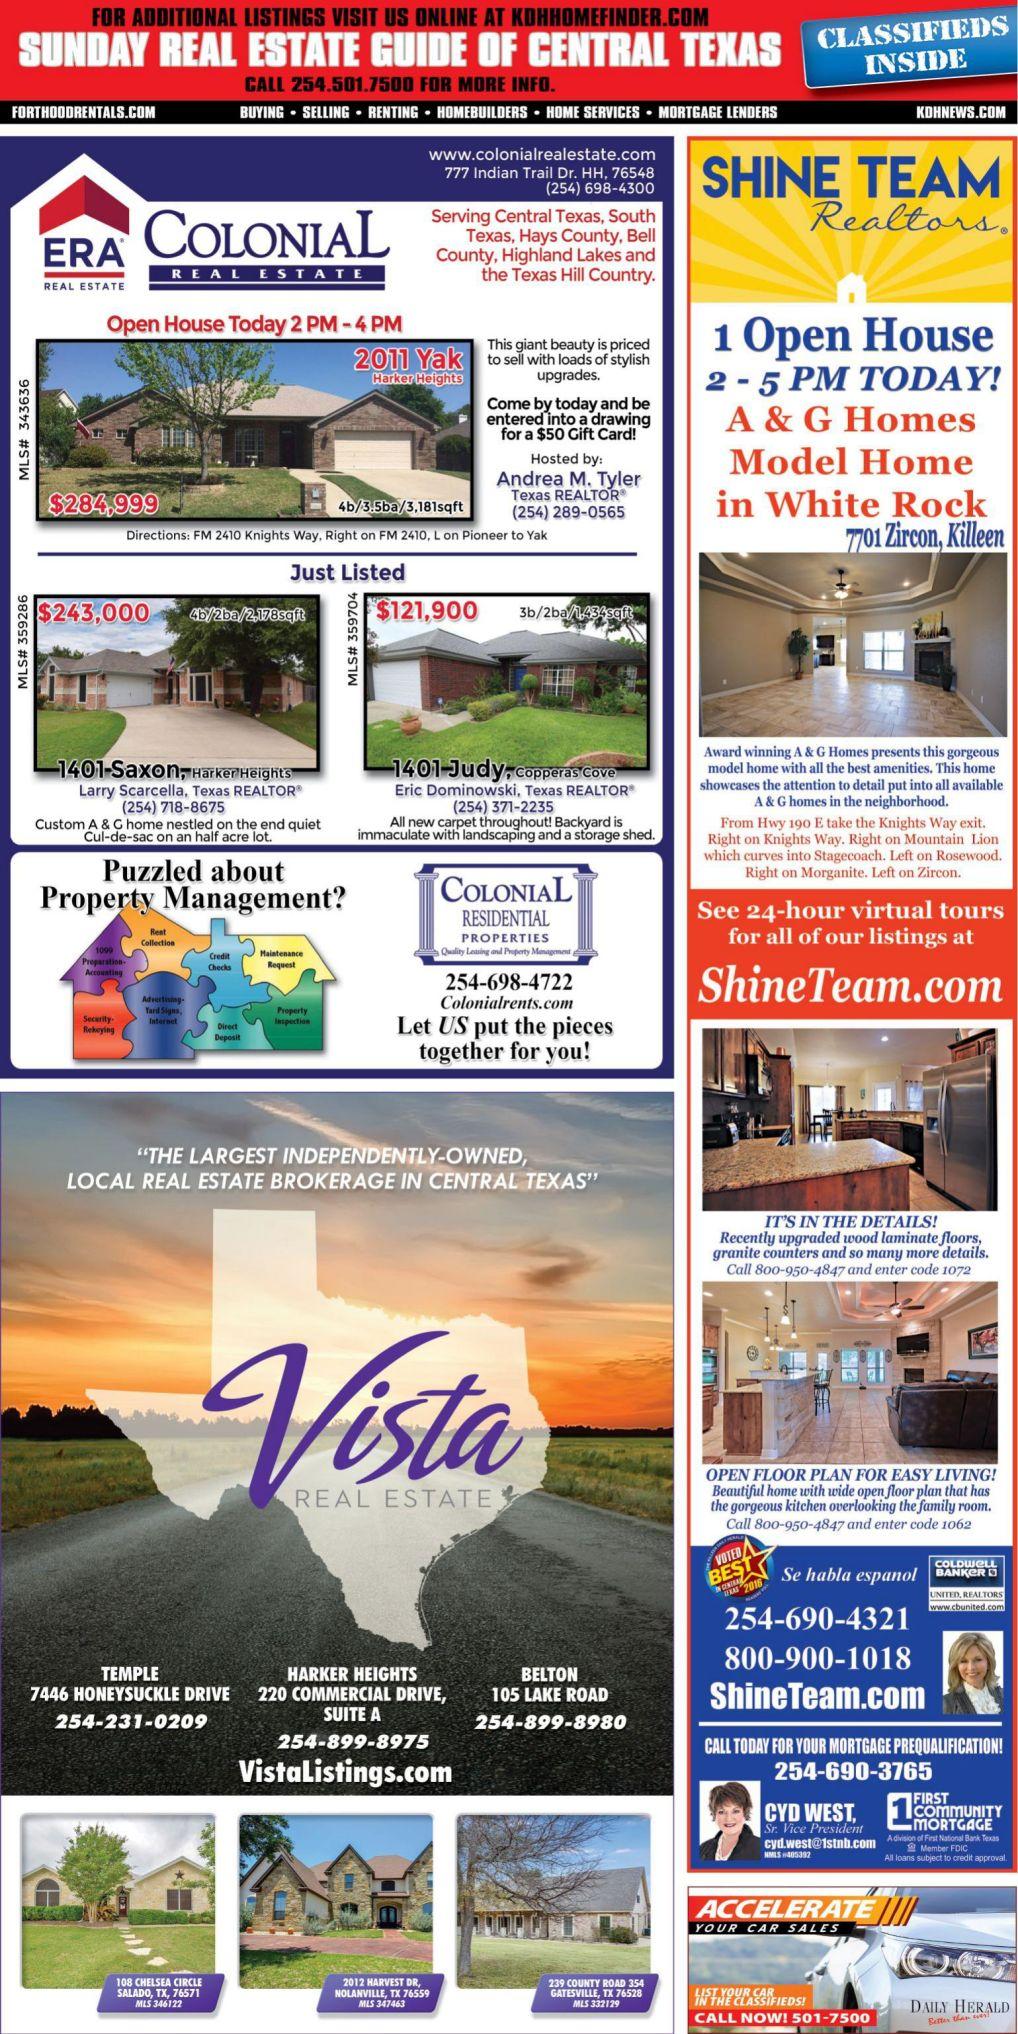 Sunday Real Estate Guide Sept 23rd